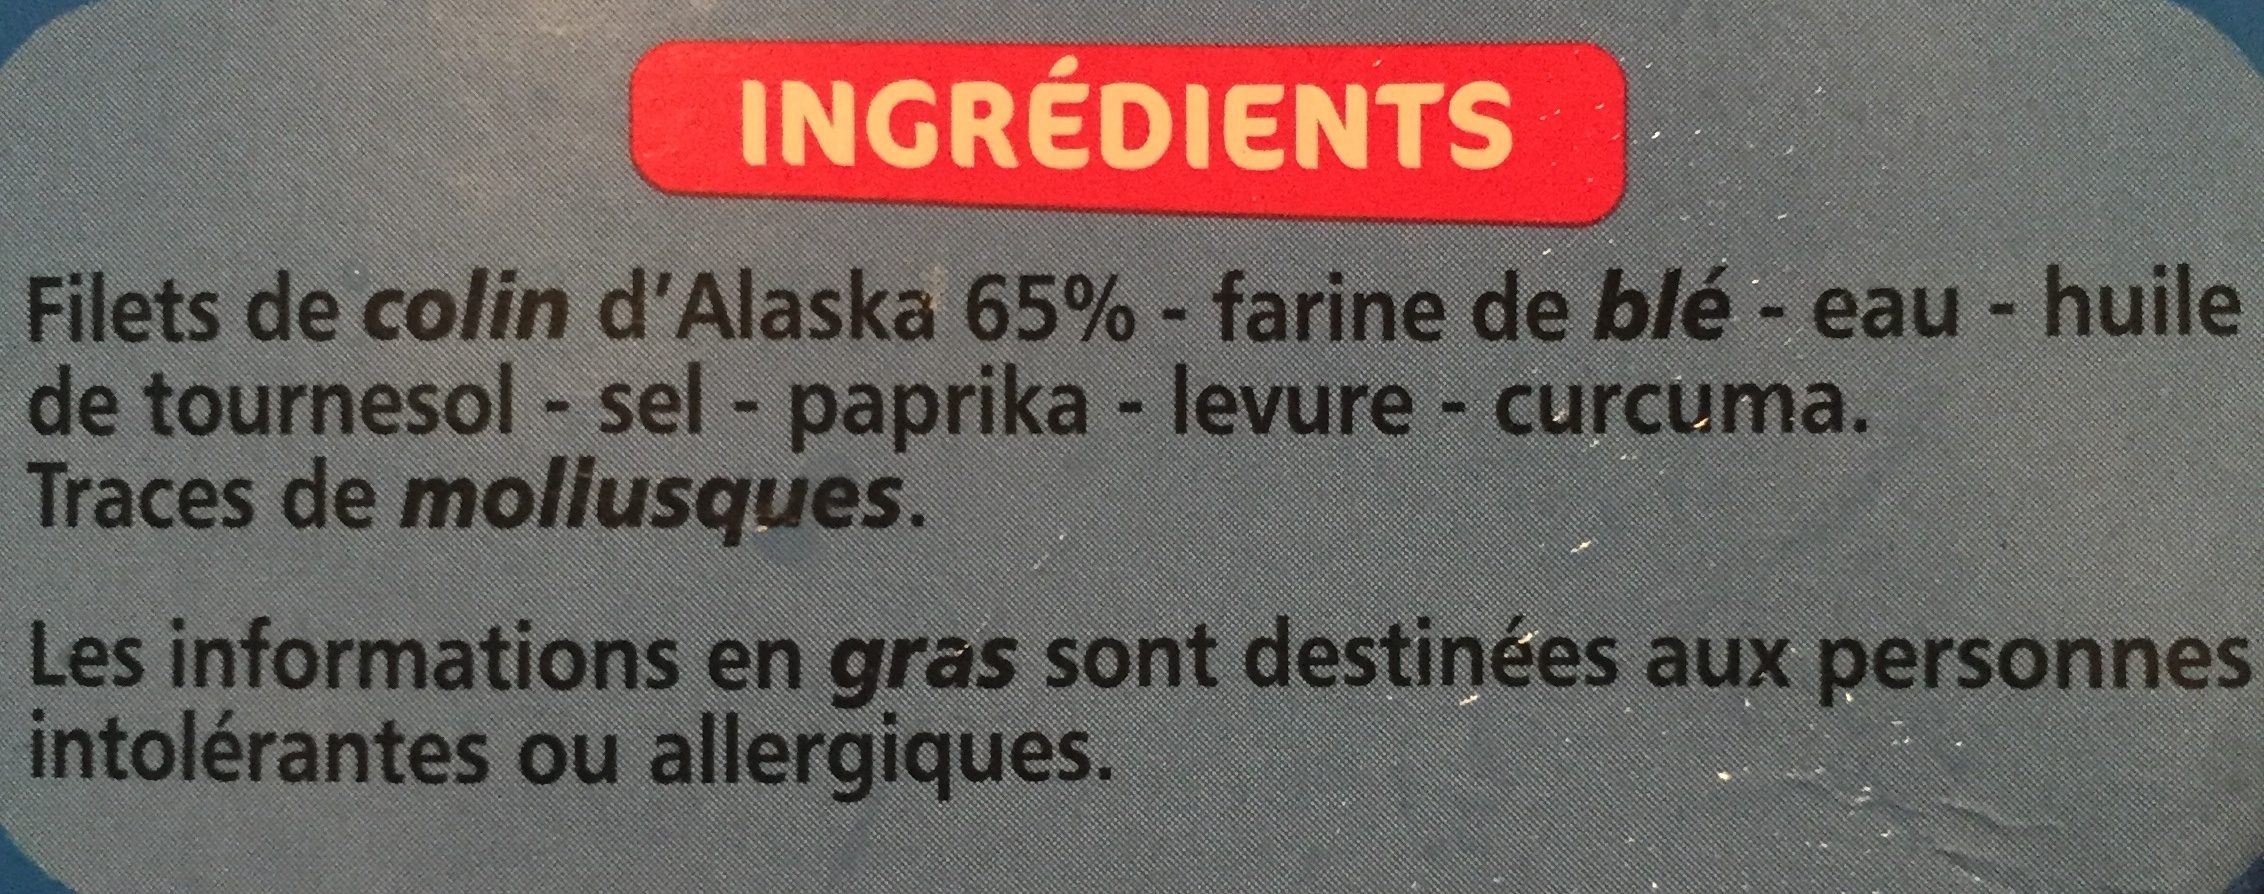 Bâtonnets de filets de colin d'Alaska panés - Ingrediënten - fr